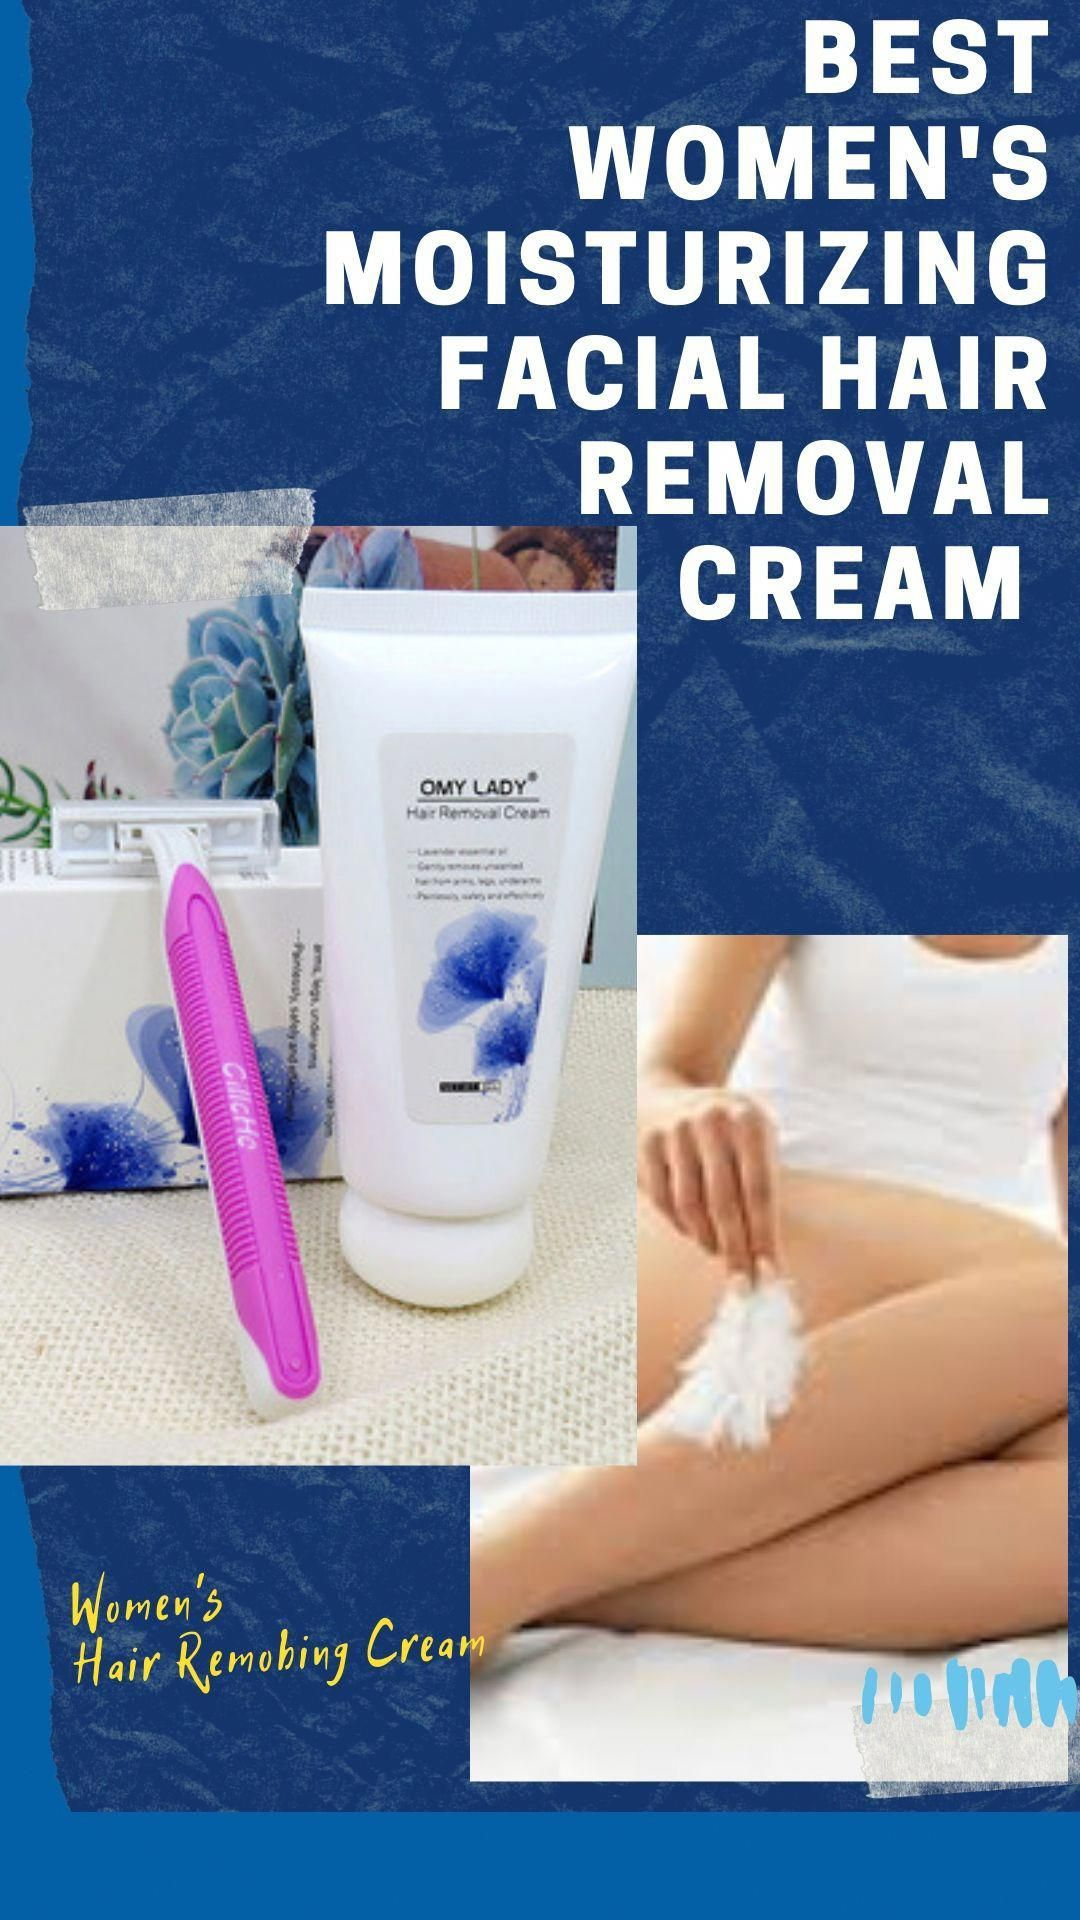 Best Women's Moisturizing Facial Hair Removal Cream  #fashionlovers #instagood #fashion #love #beaut...